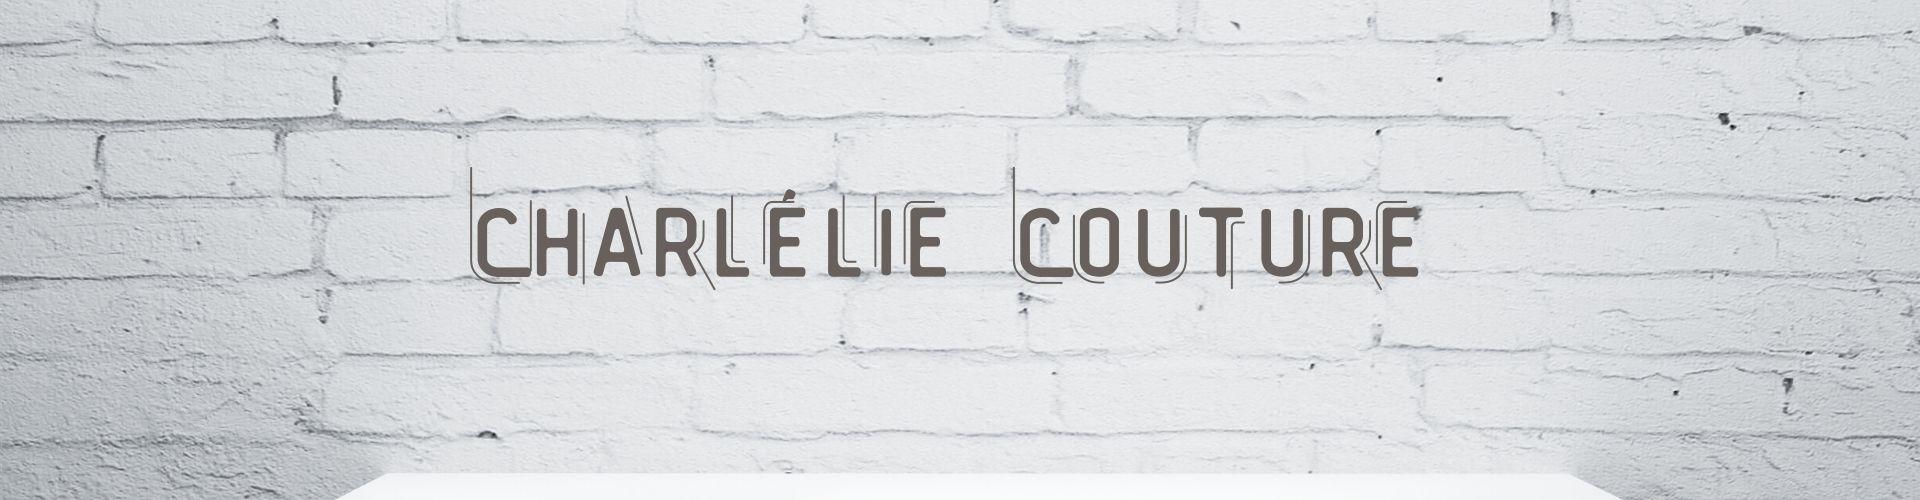 Charlelie couture : Artiste Français de l'Art Urbain